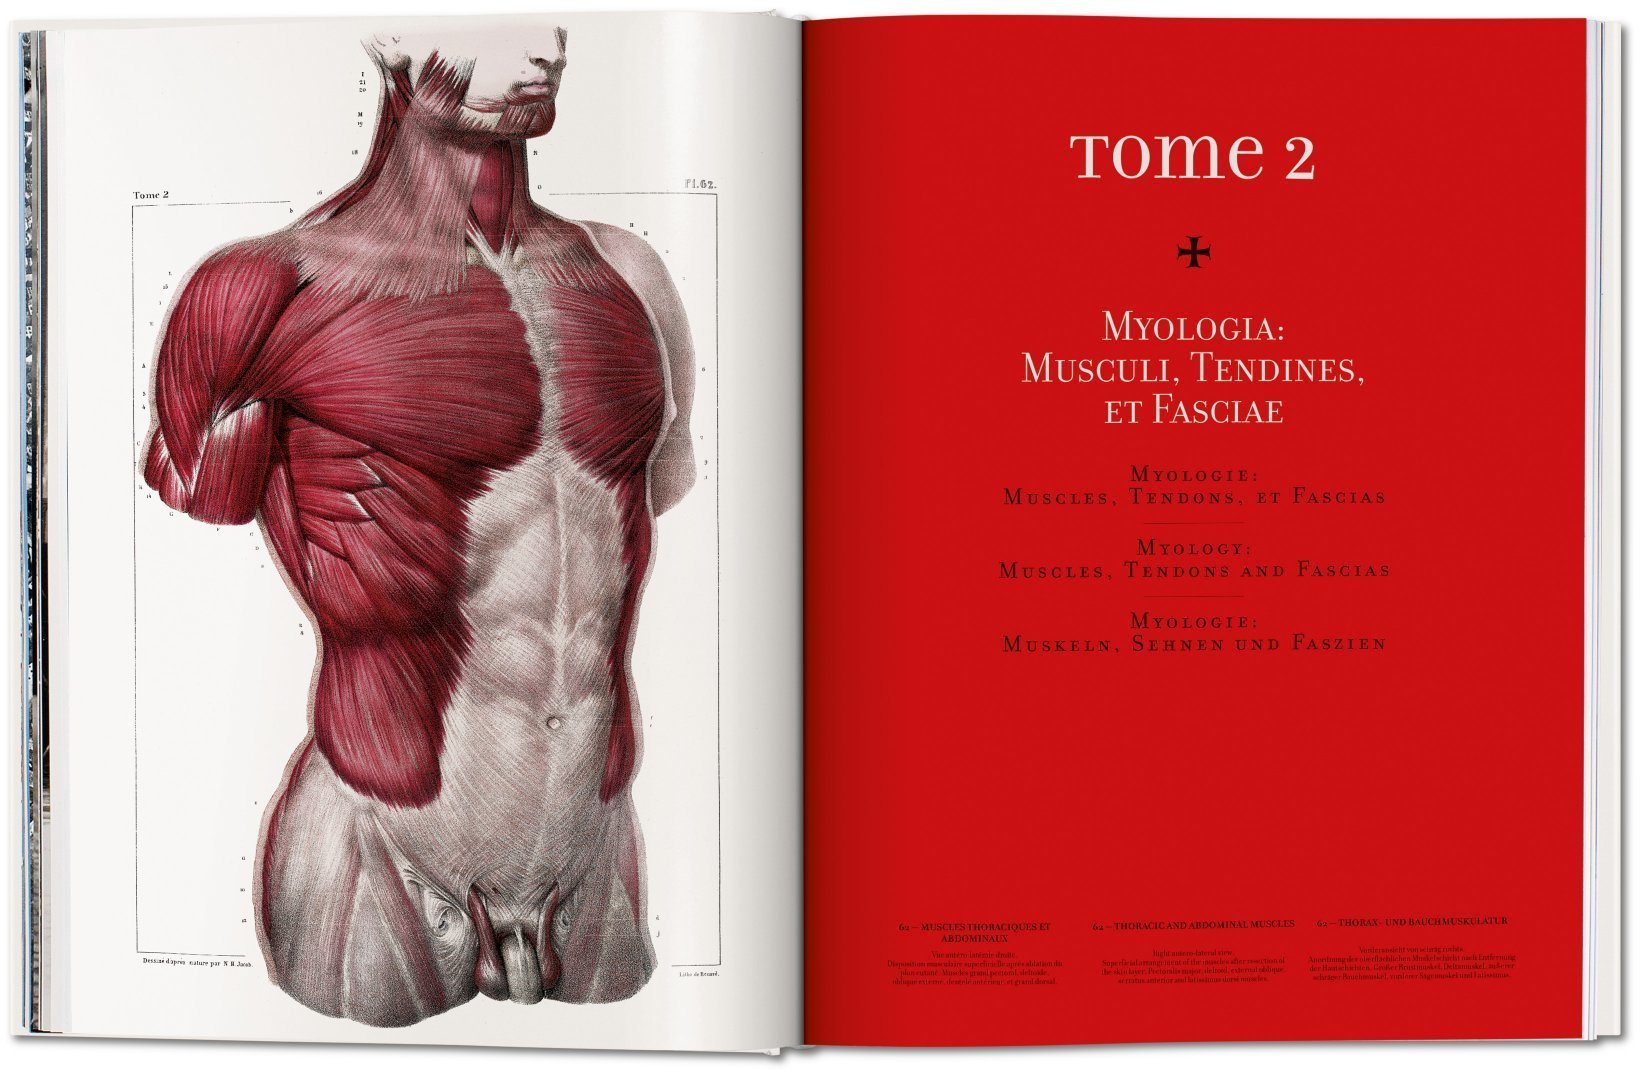 Bourgery. Atlas of Human Anatomy and Surgery (Fp): Amazon.de: Jean ...